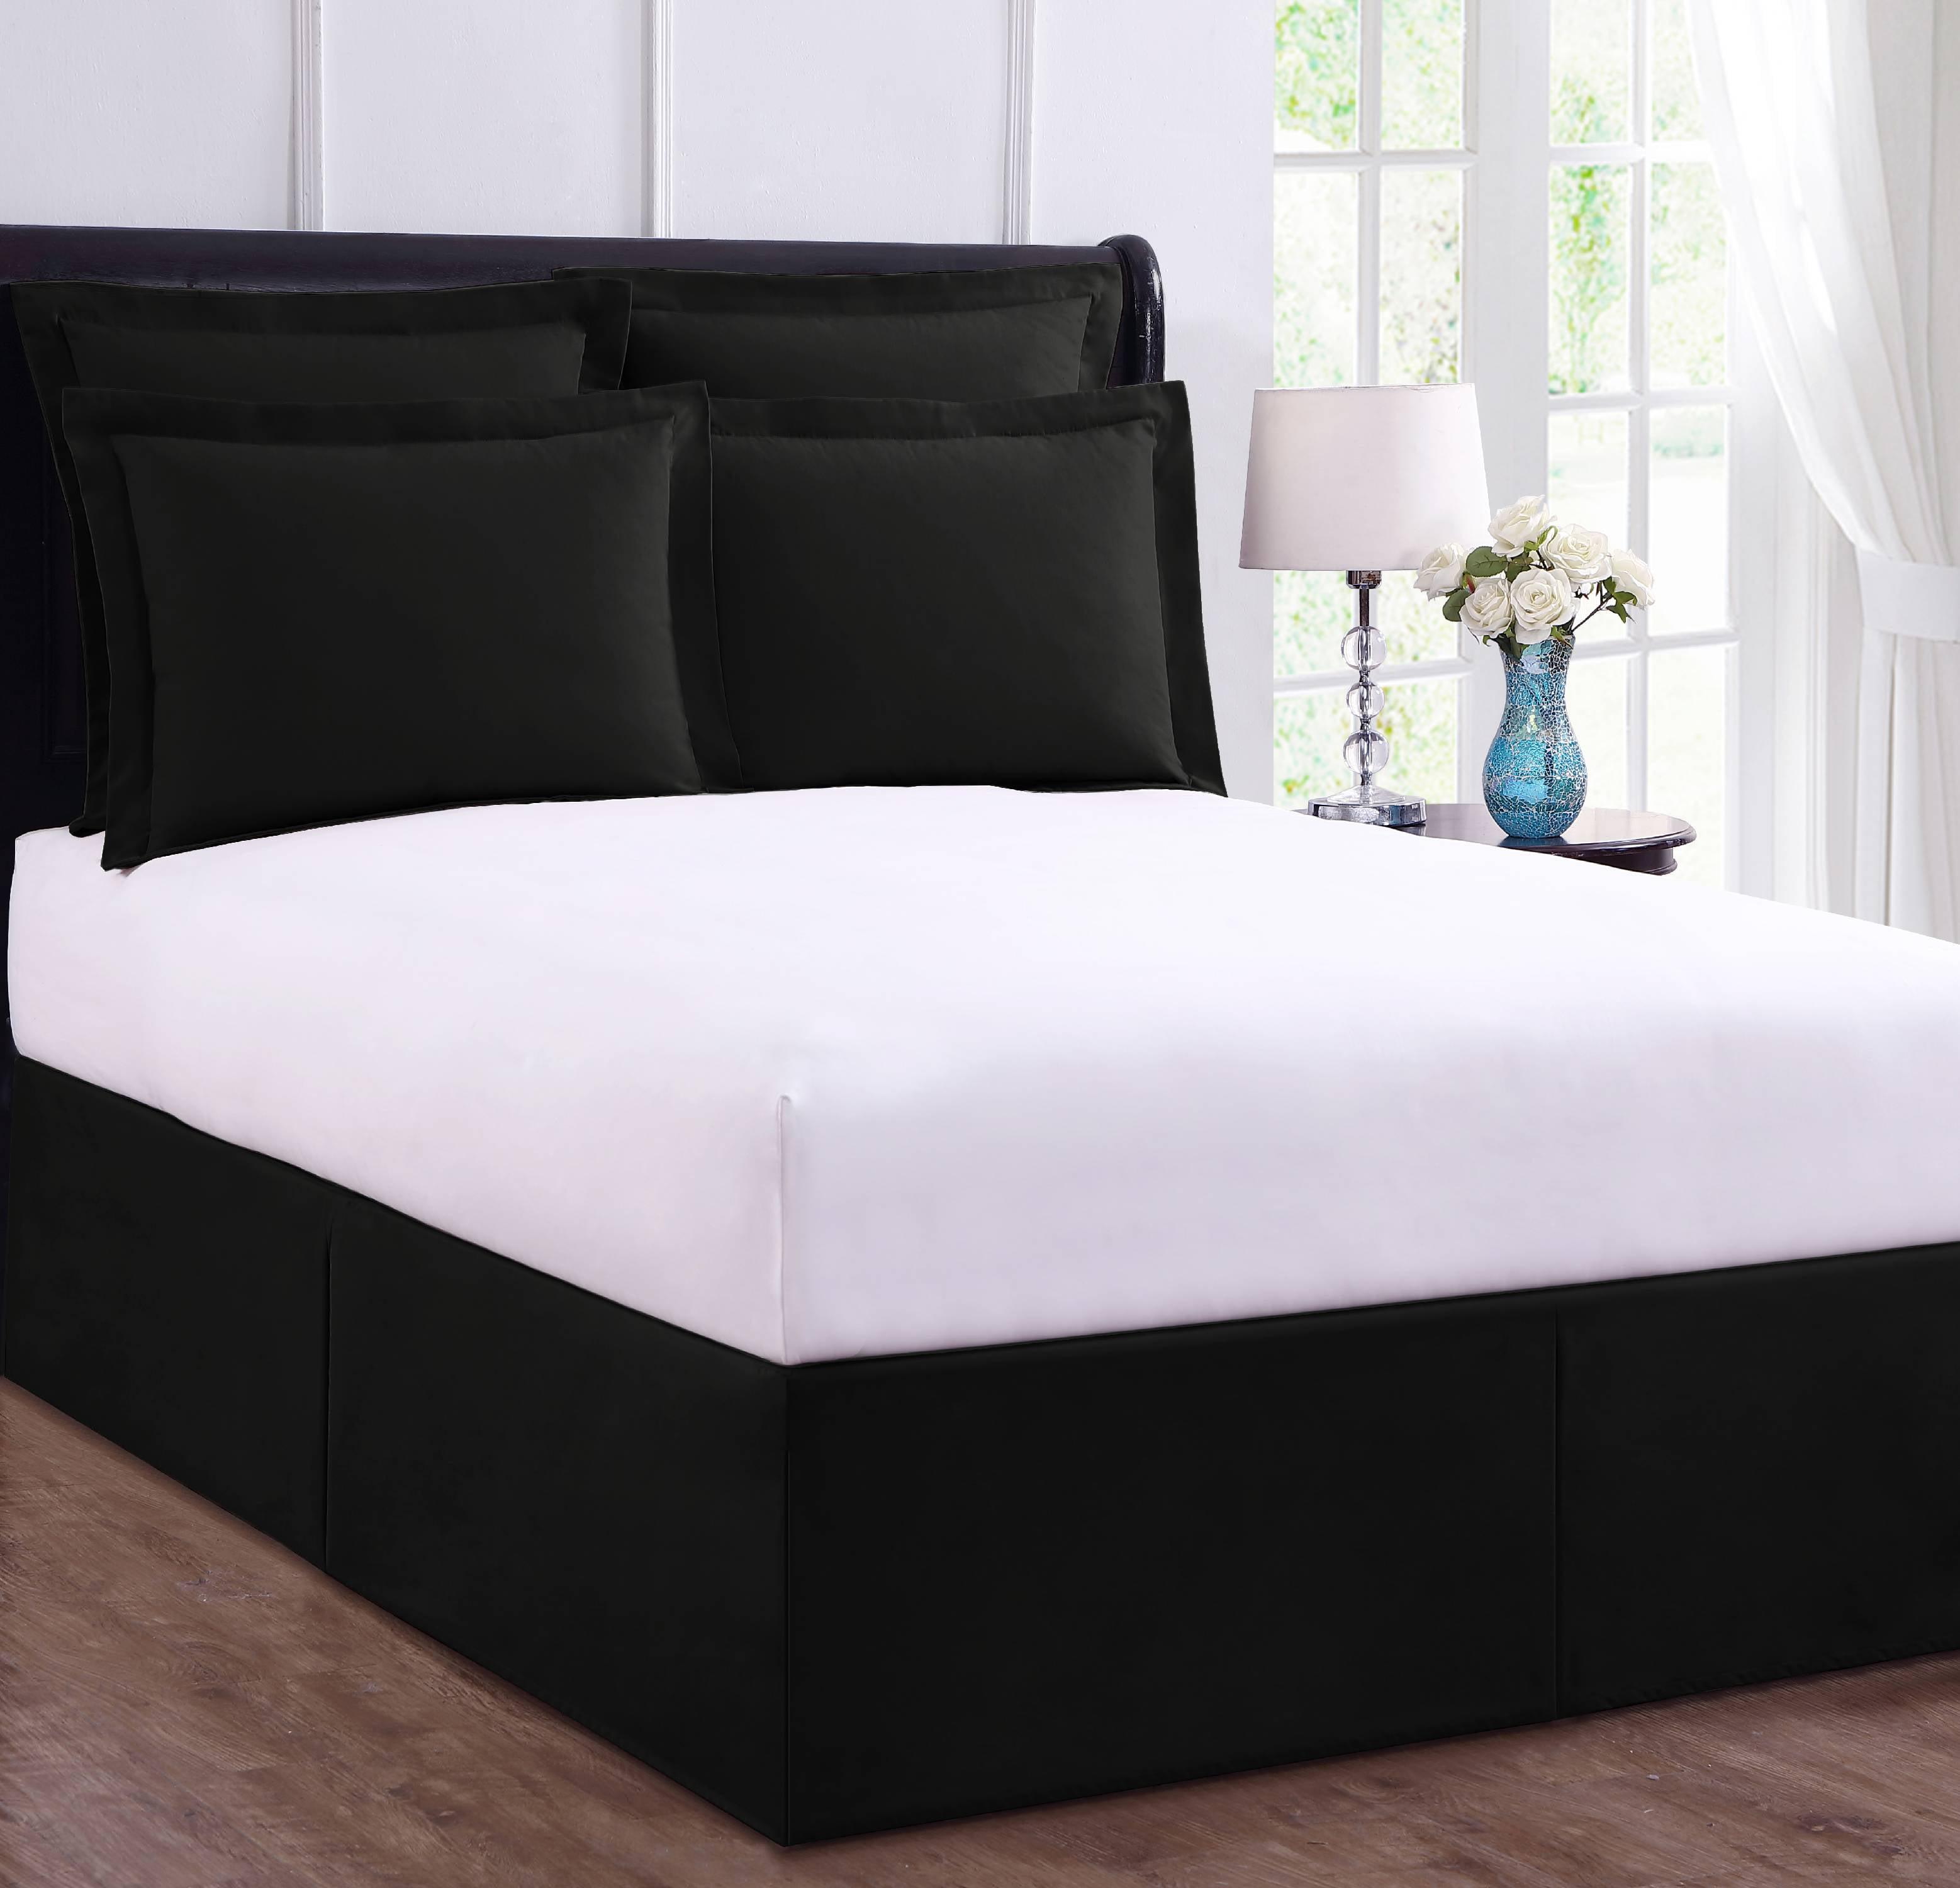 Bed Maker S Wrap Around Tailored Bedding Bed Skirt Walmart Com Walmart Com